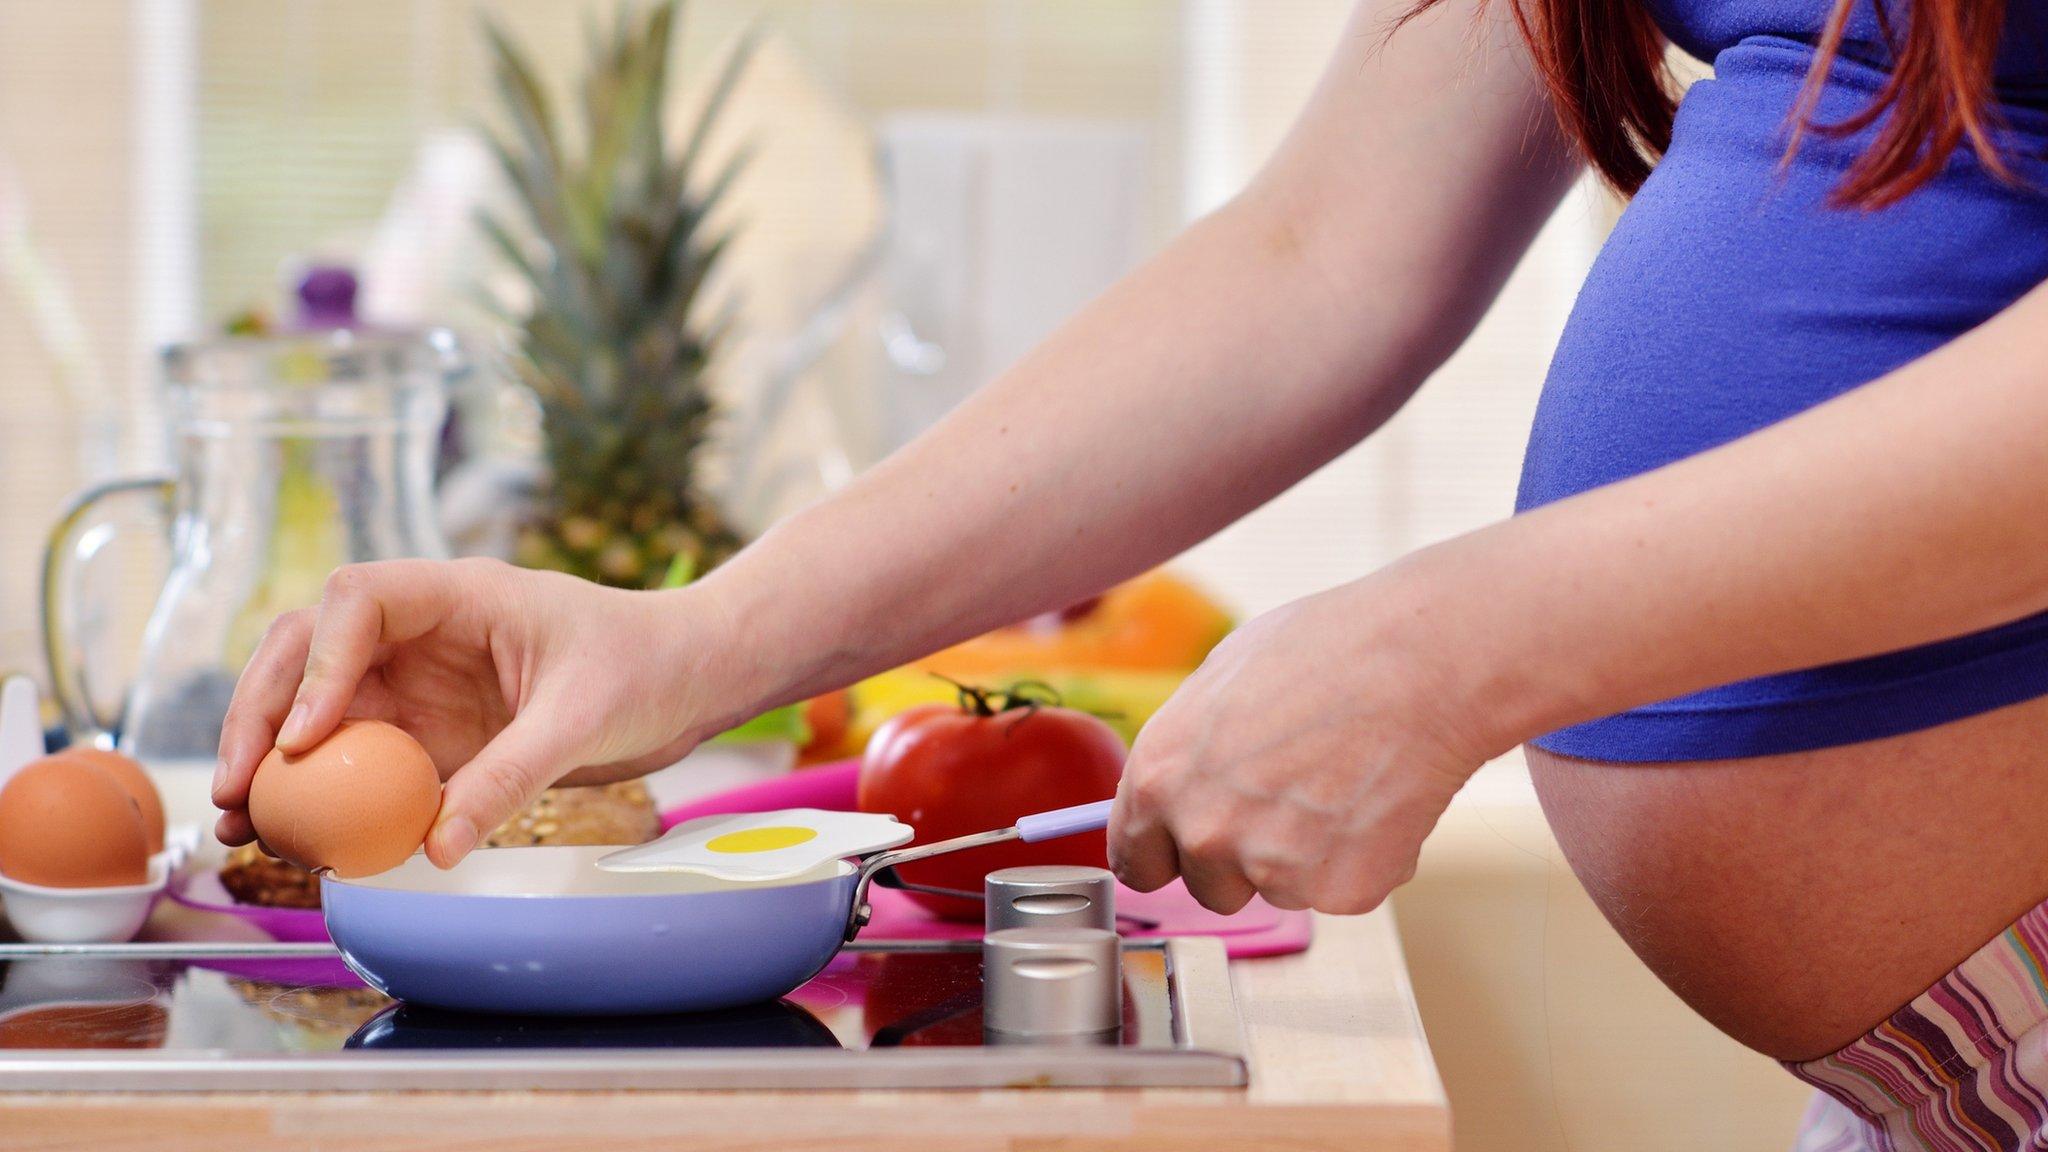 Raw eggs 'safe for pregnant women'